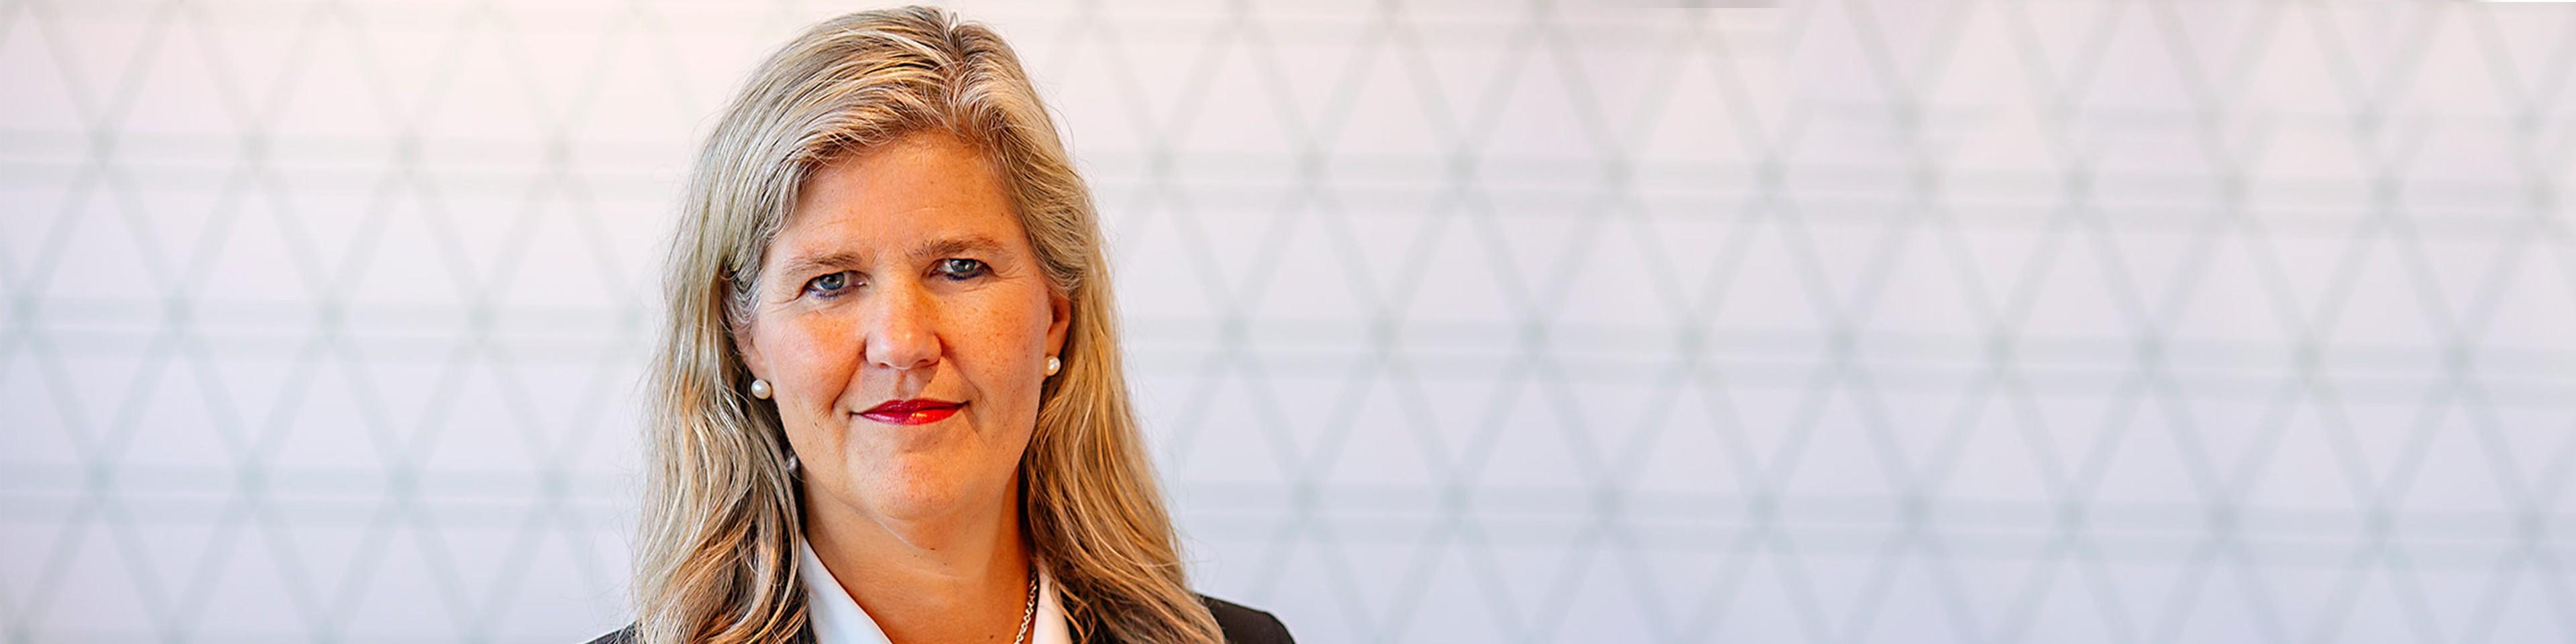 Karin Apelman generalsekreterare FAR Foto Kristofer Hedlund